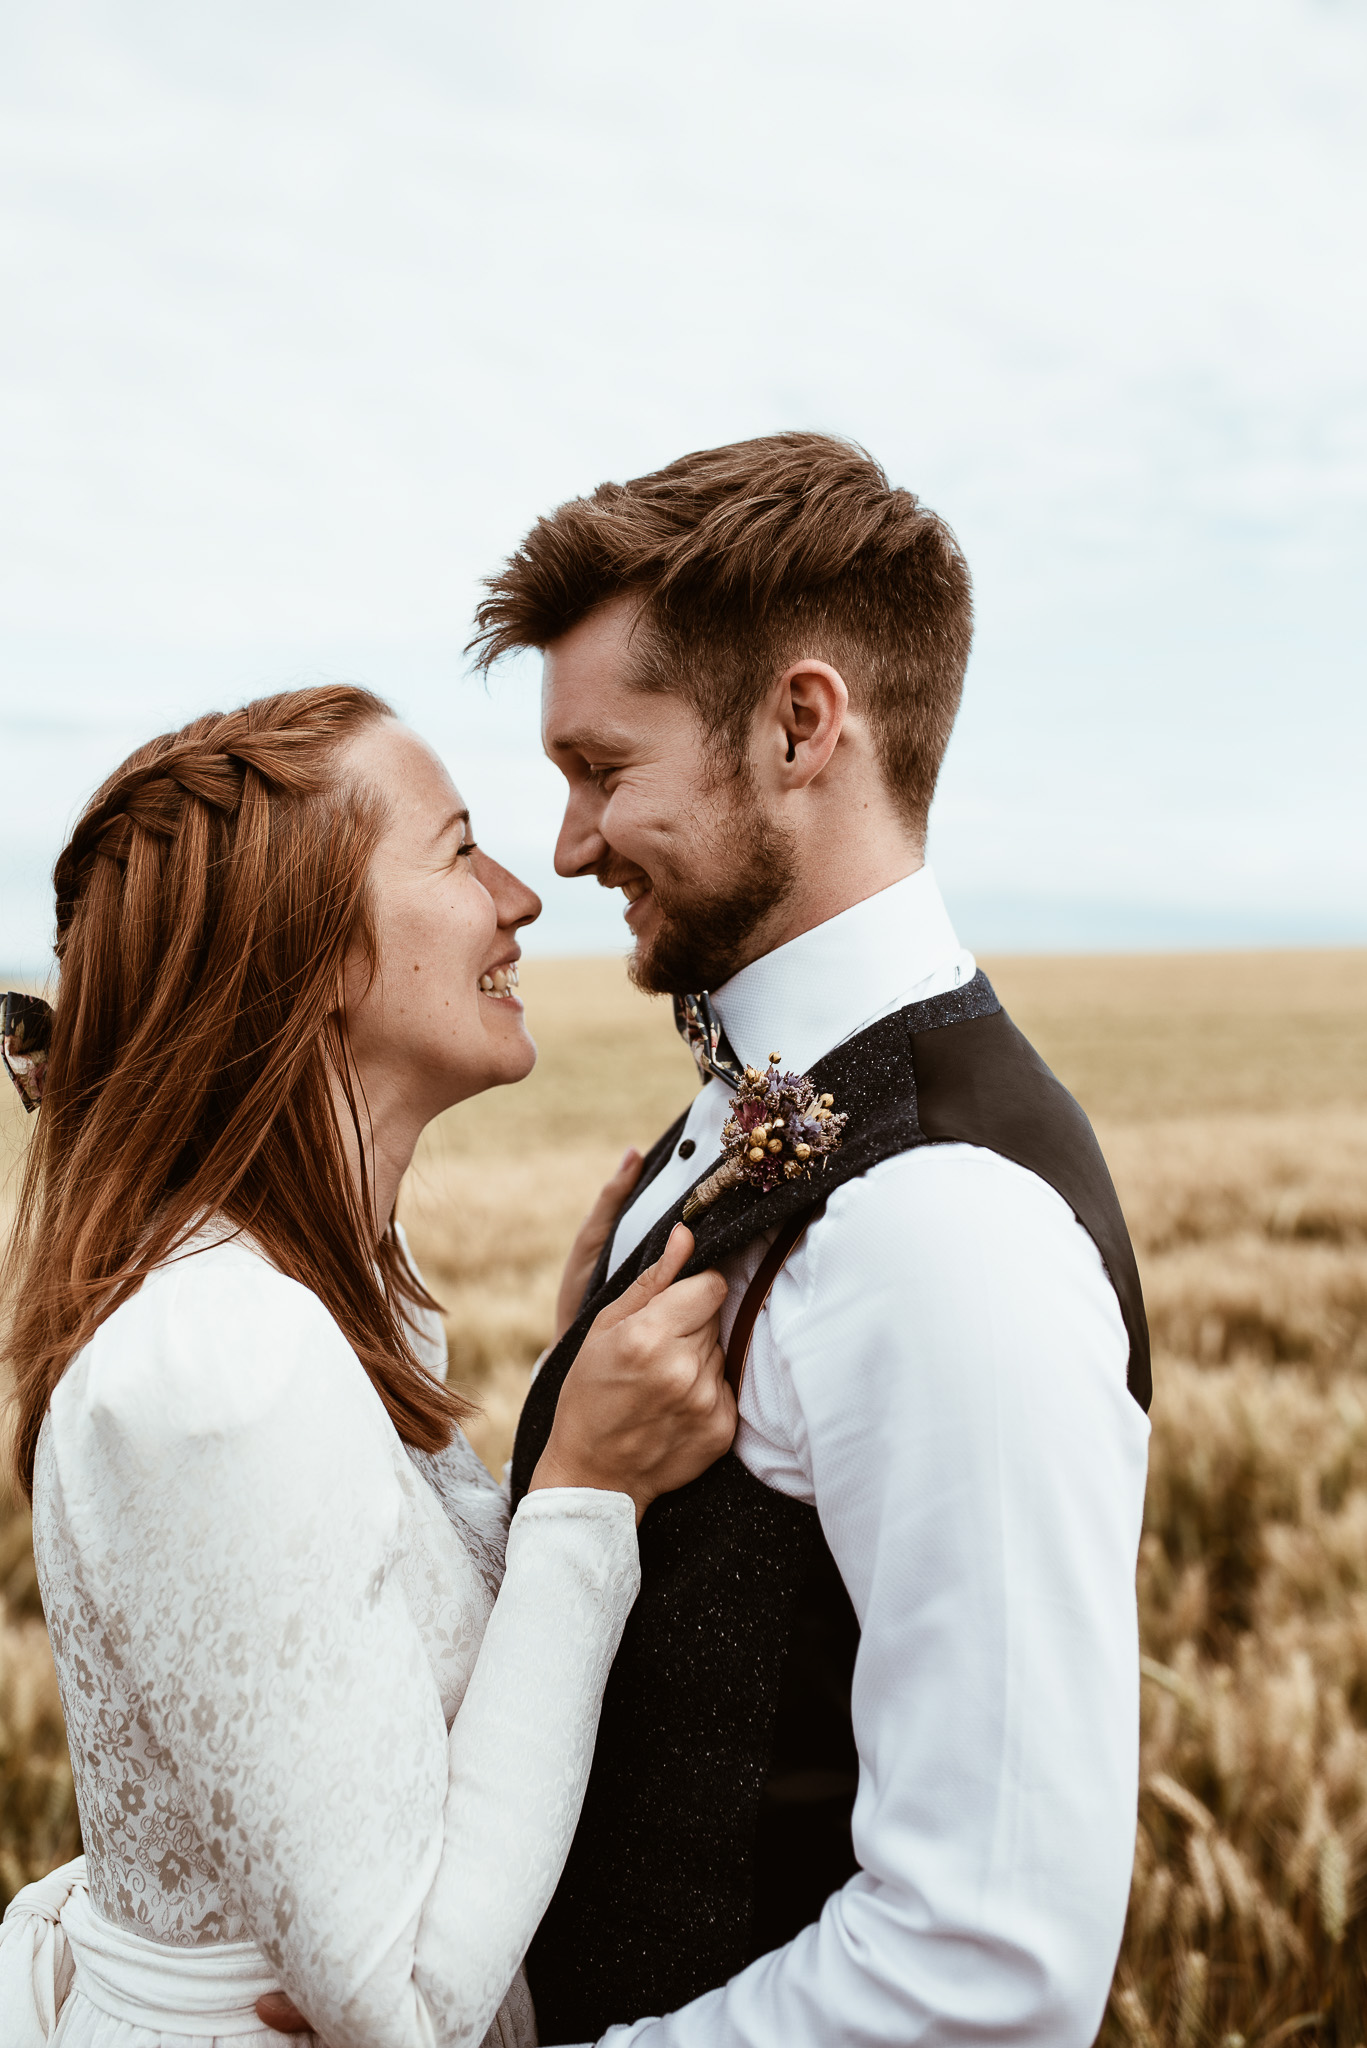 Wedding Photography. Rosedew Farm, South Wales.